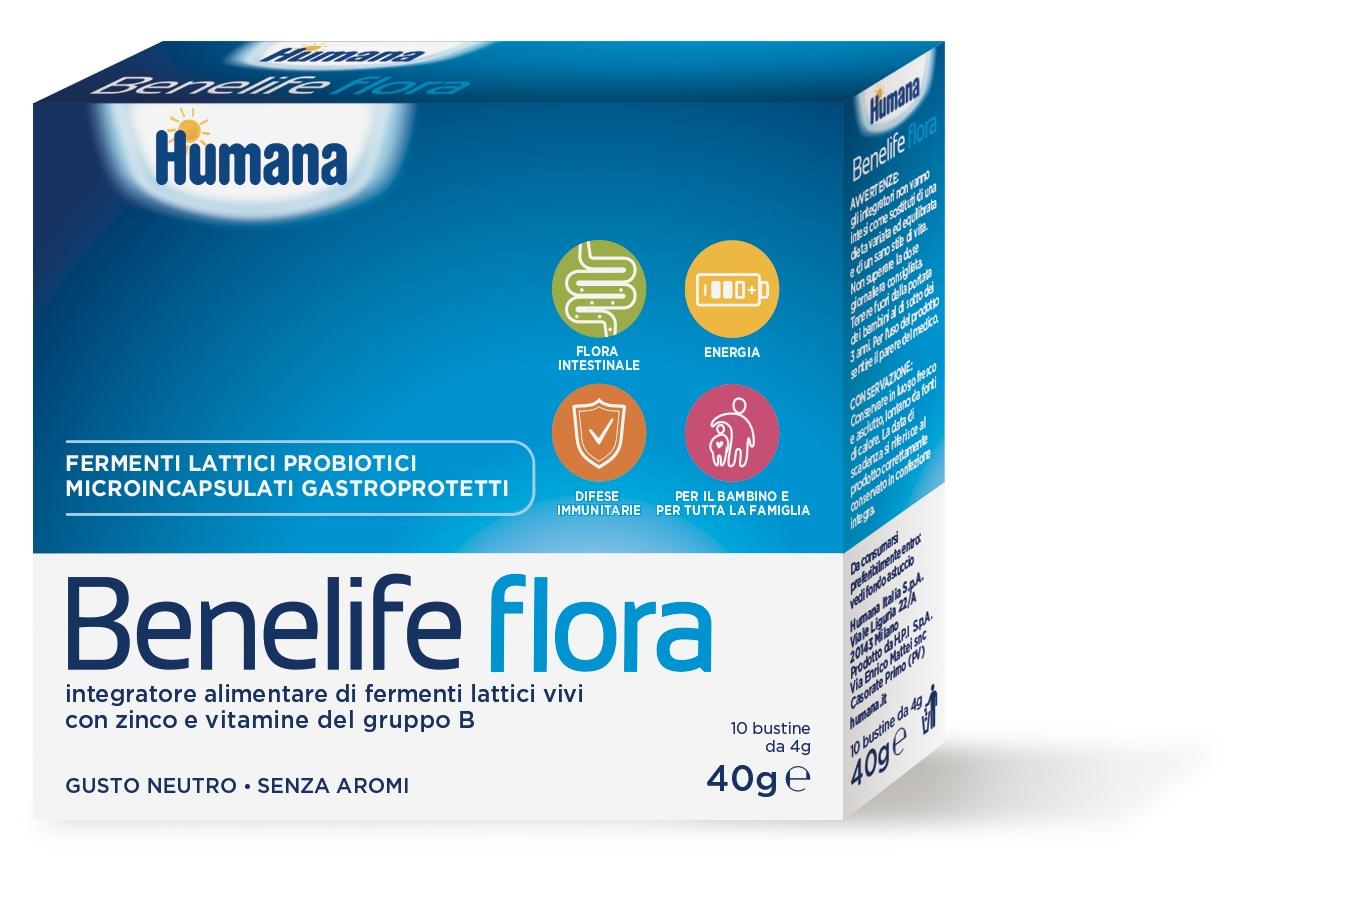 Humana Benelife Flora 10 bustine